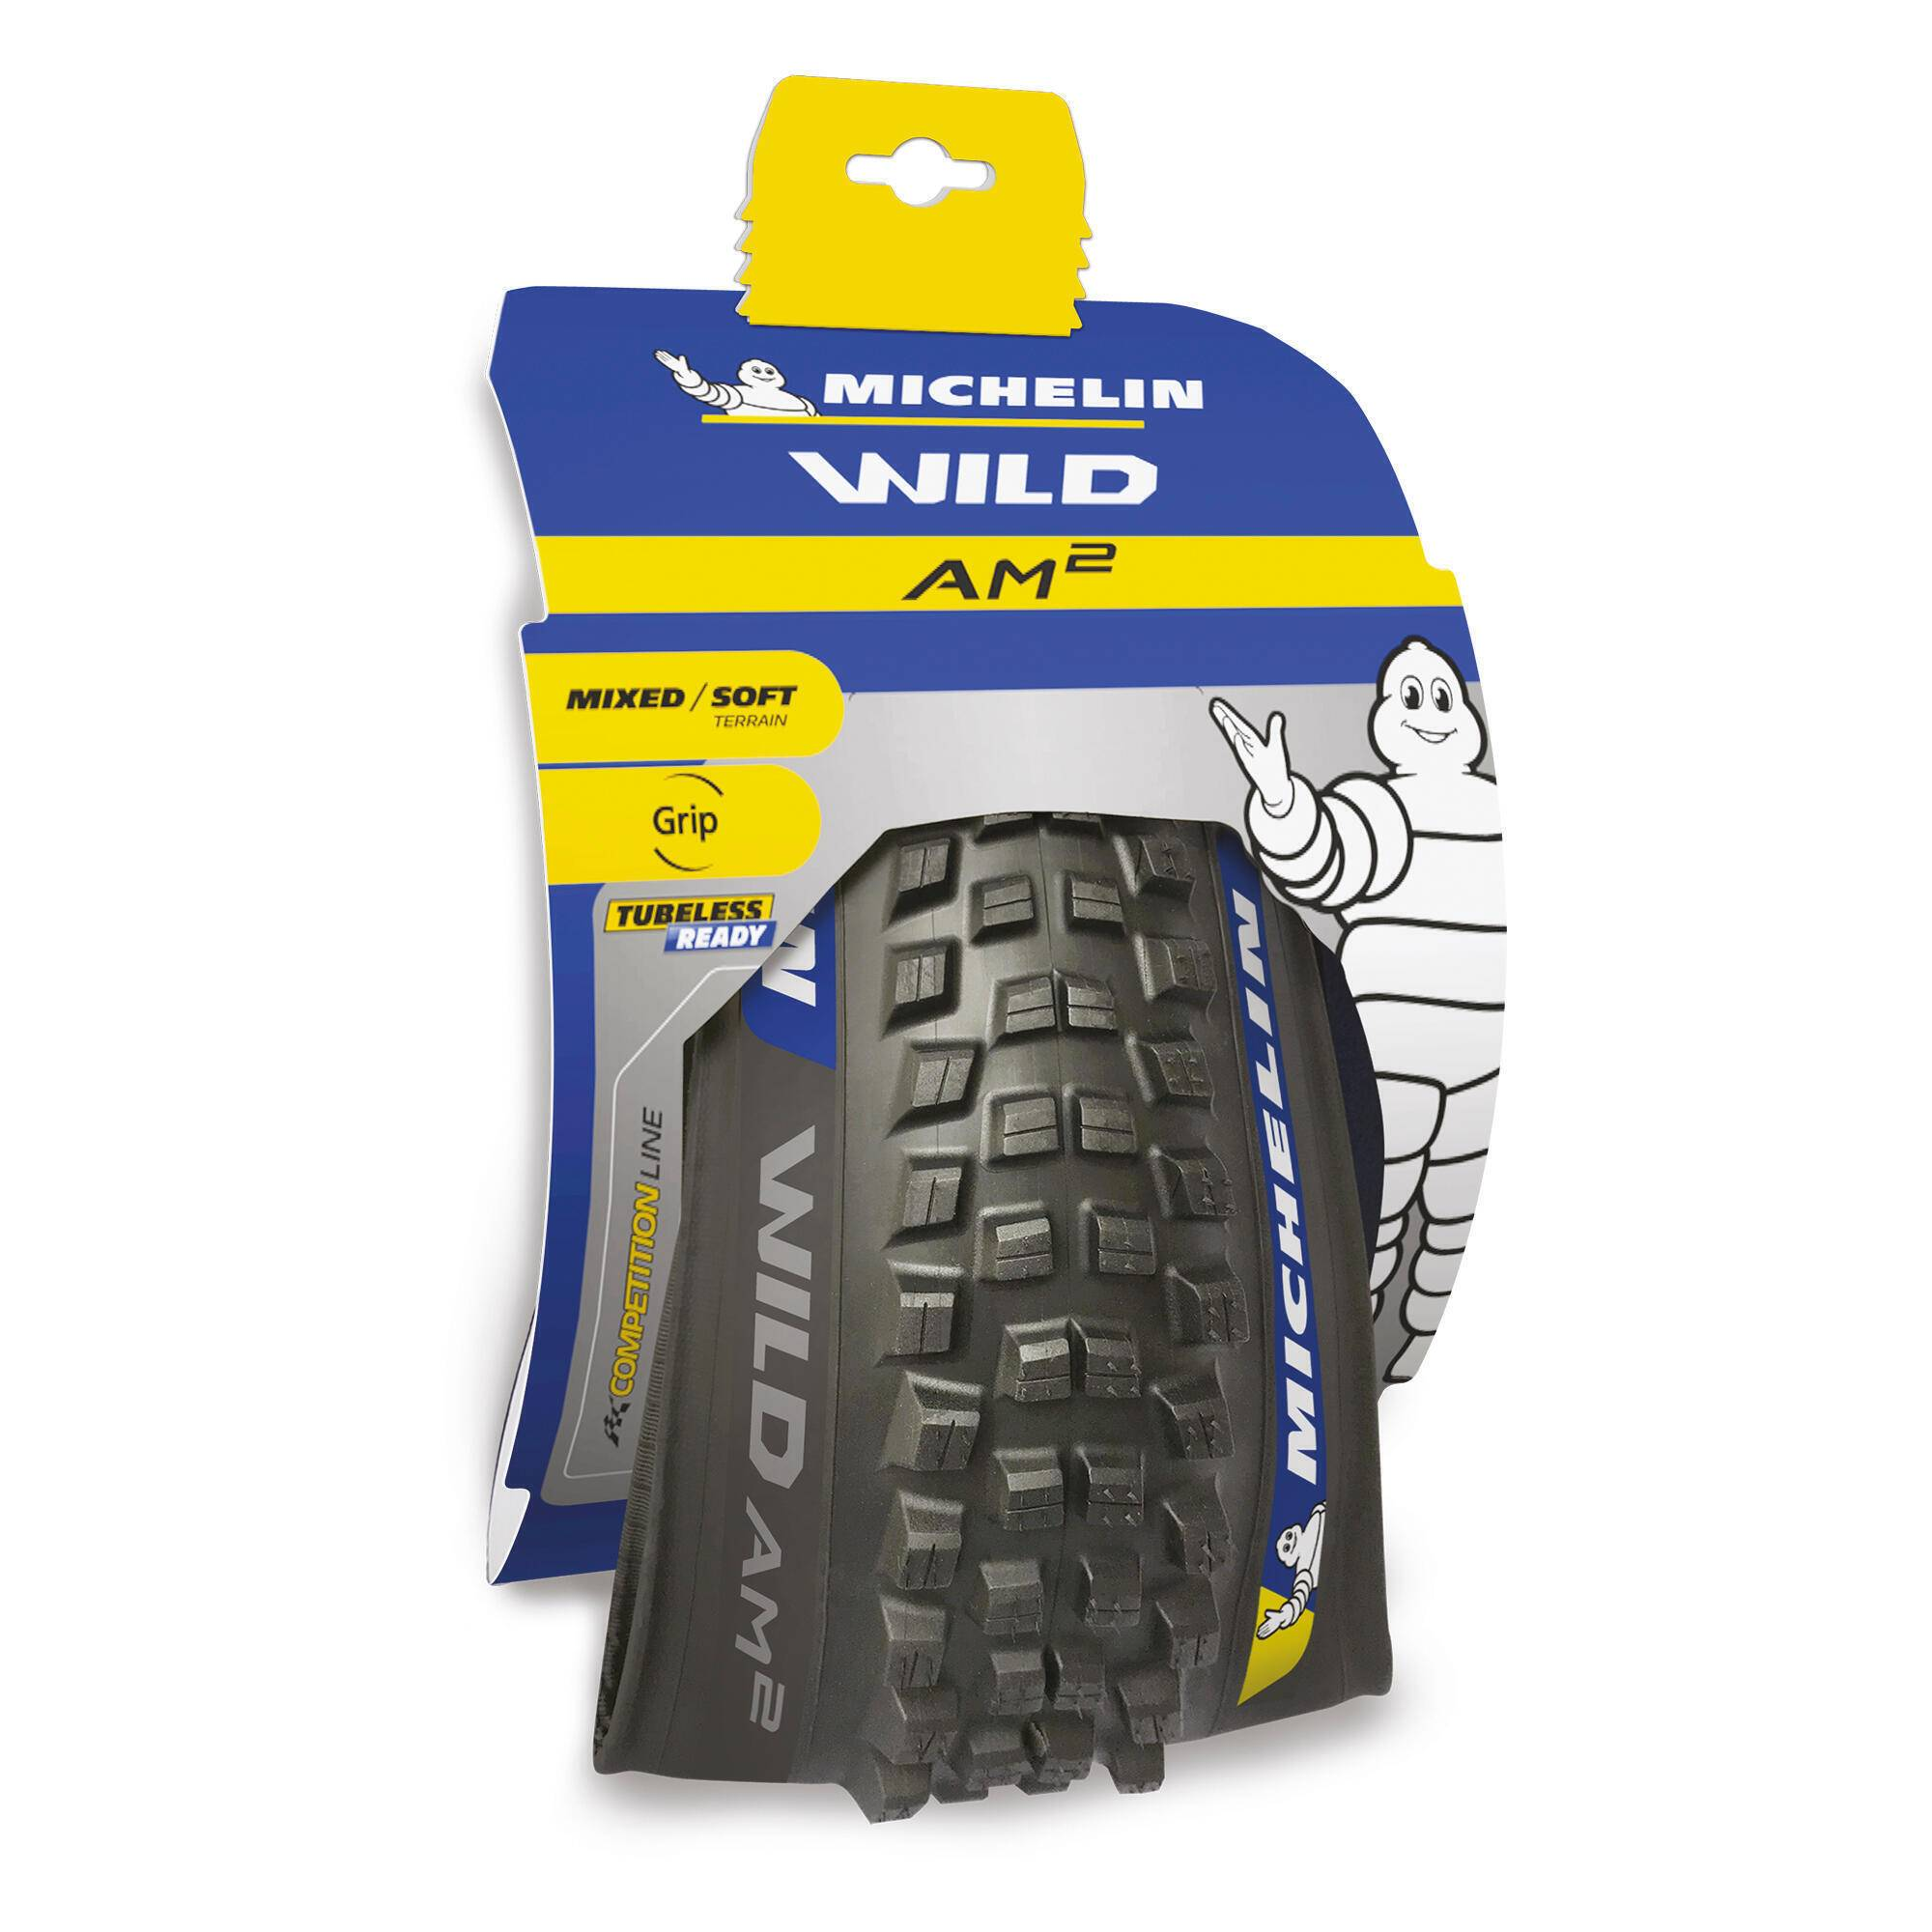 Michelin Copertone  MTB WILD AM2 COMPETITION LINE 29 x 2,4 Tubeless Ready